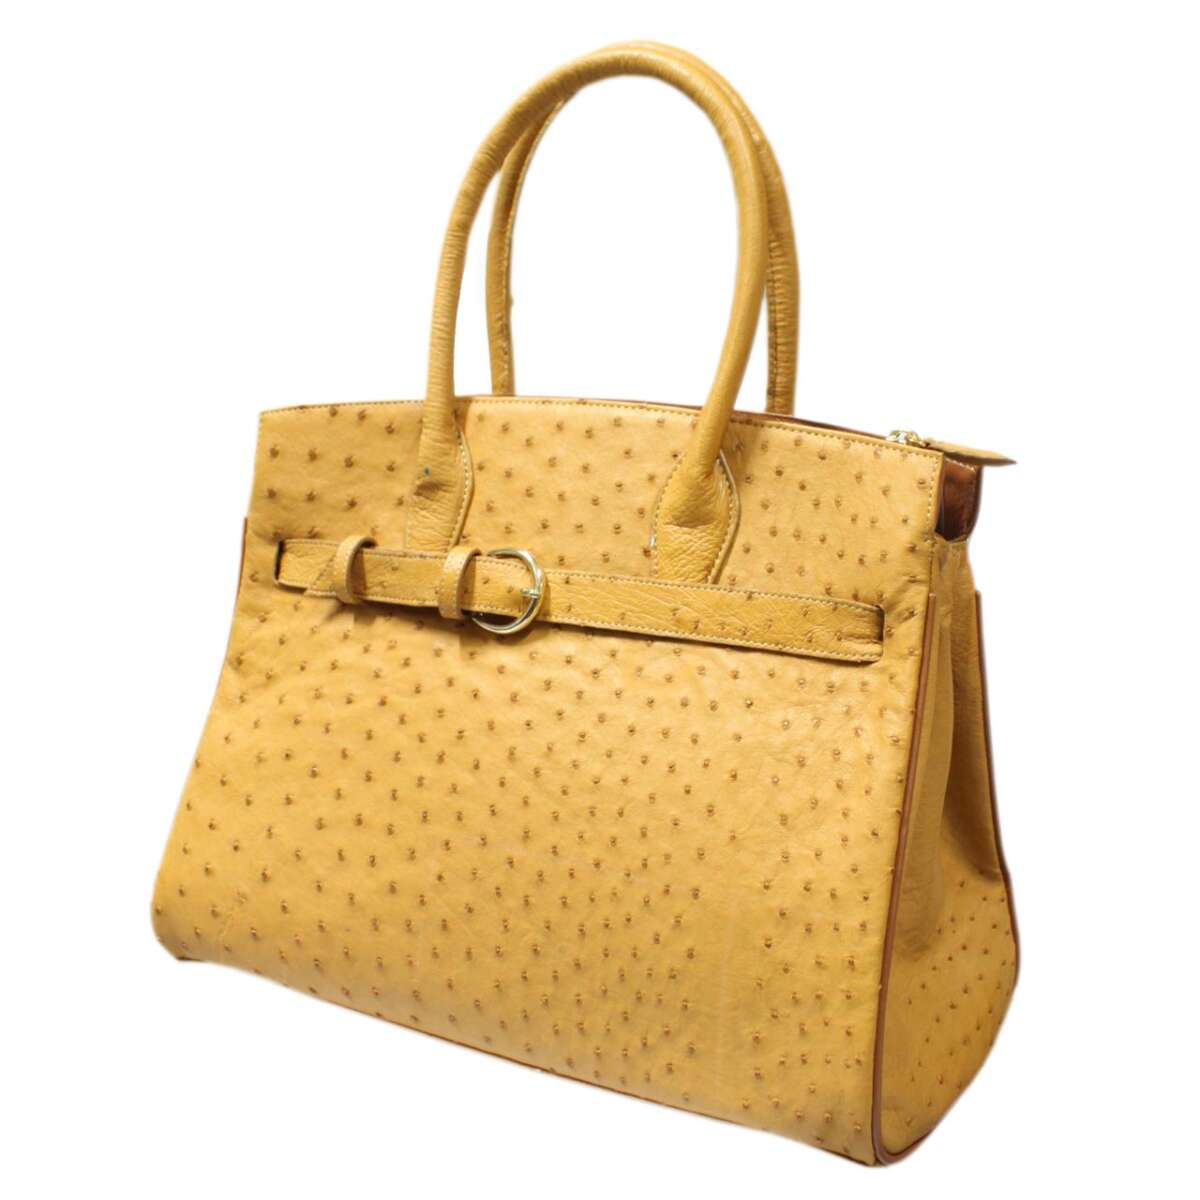 Túi xách nữ da đà điểu E007c